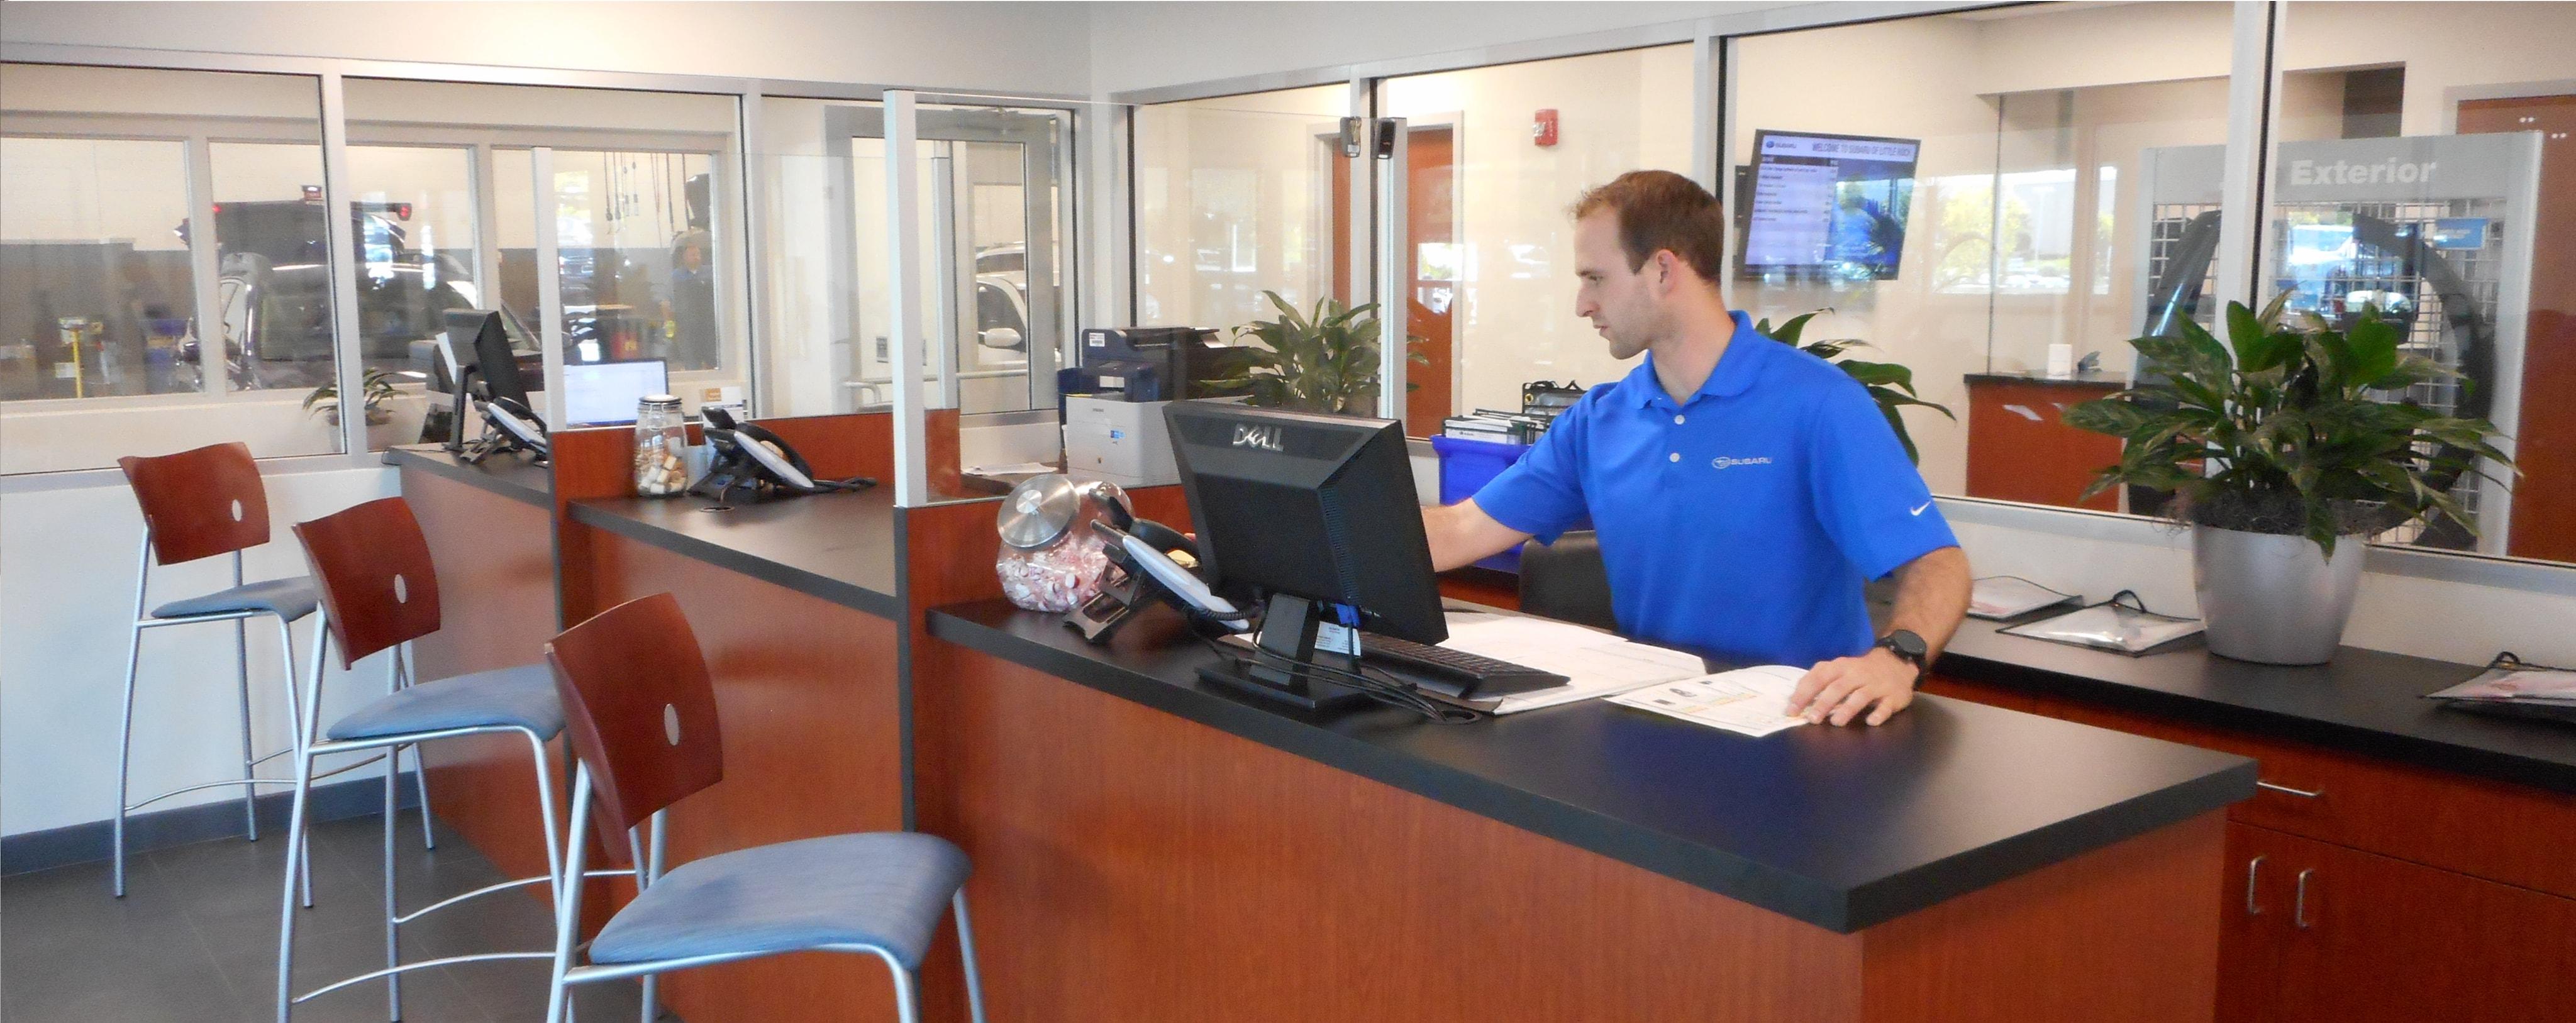 Subaru Car Repair And Service In Little Rock Subaru Of Little Rock Service Center Serving Hot